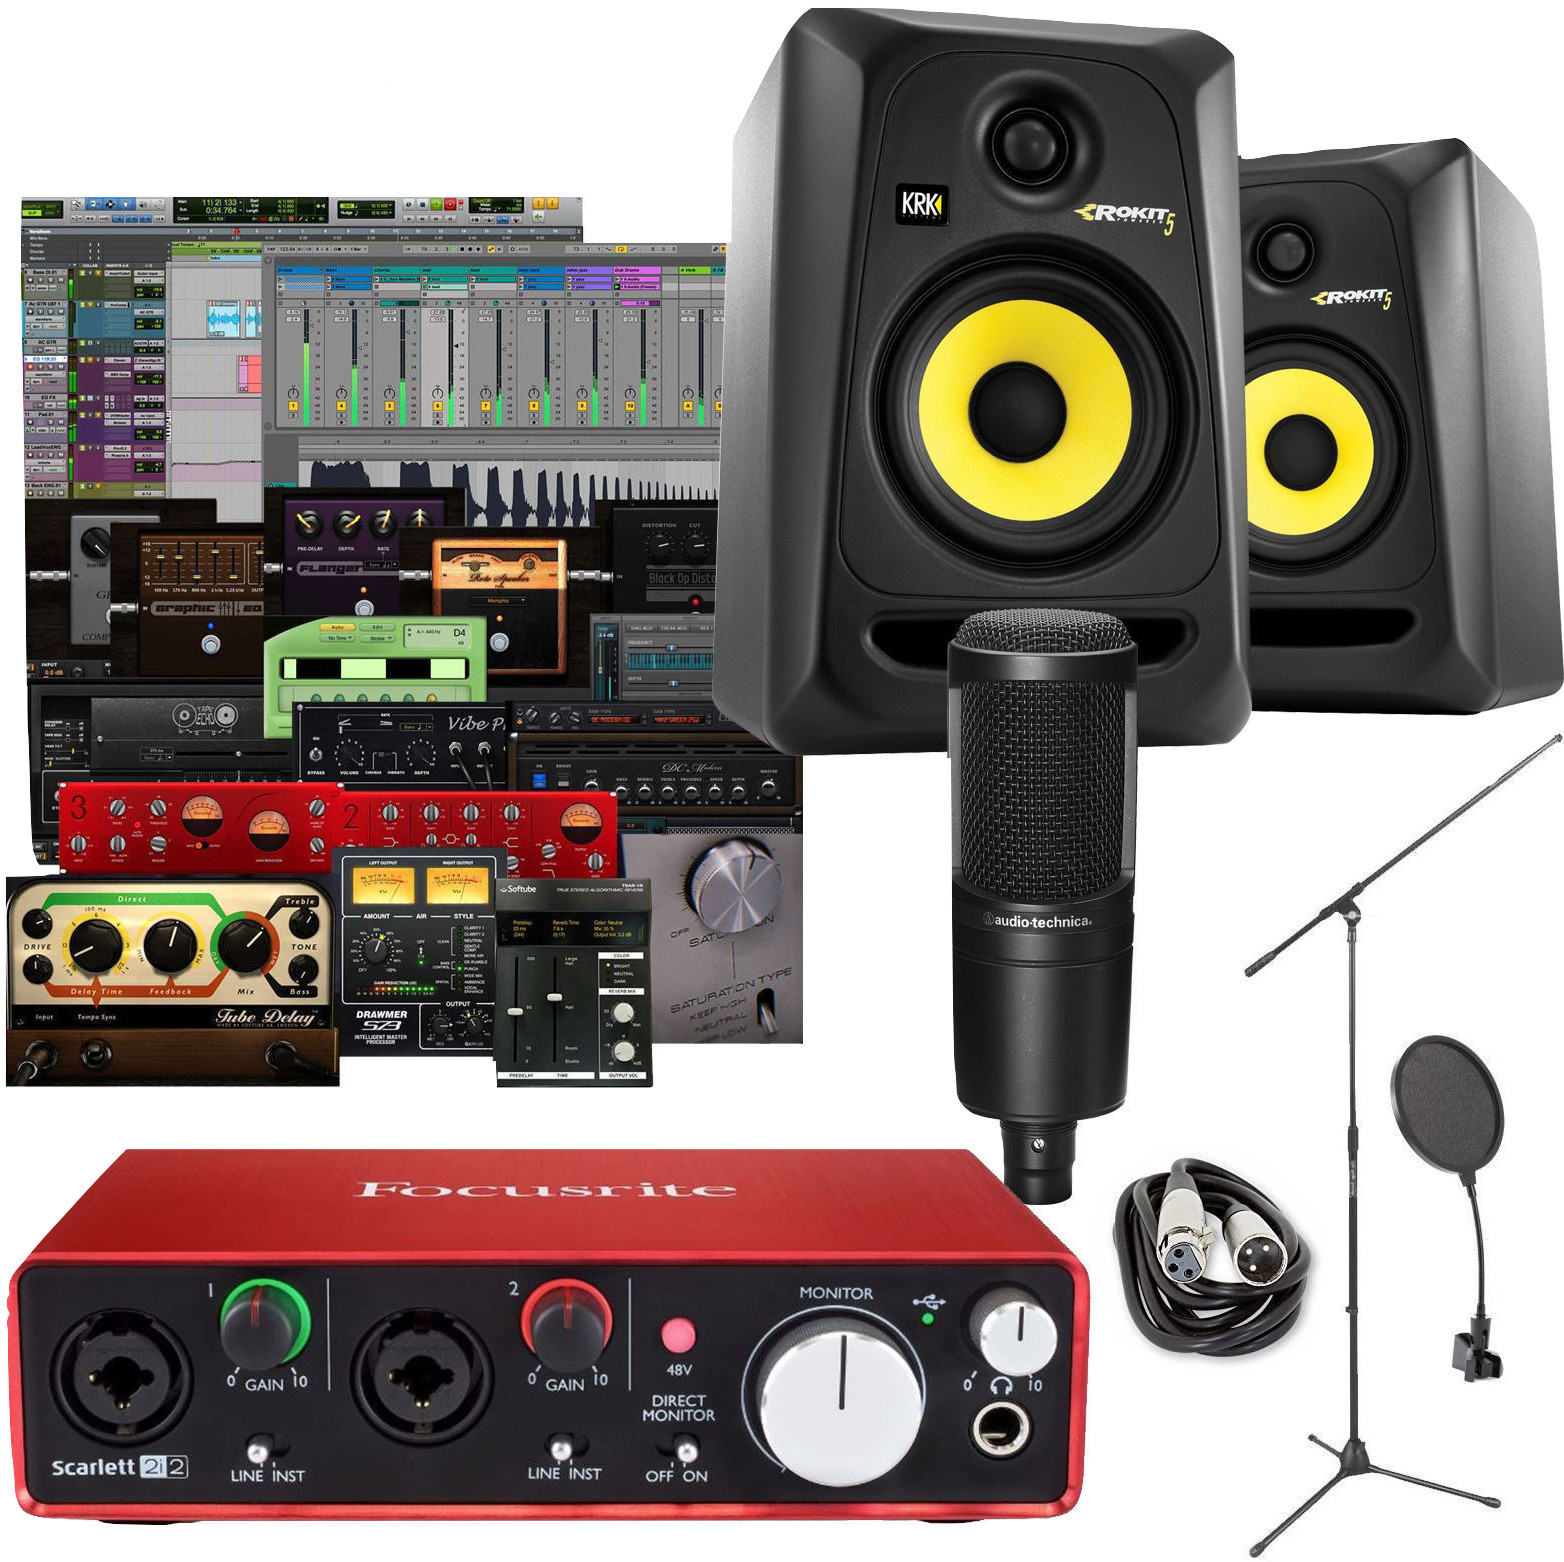 home recording studio package bundle audient audio technica krk pro tools audio midi interfaces. Black Bedroom Furniture Sets. Home Design Ideas